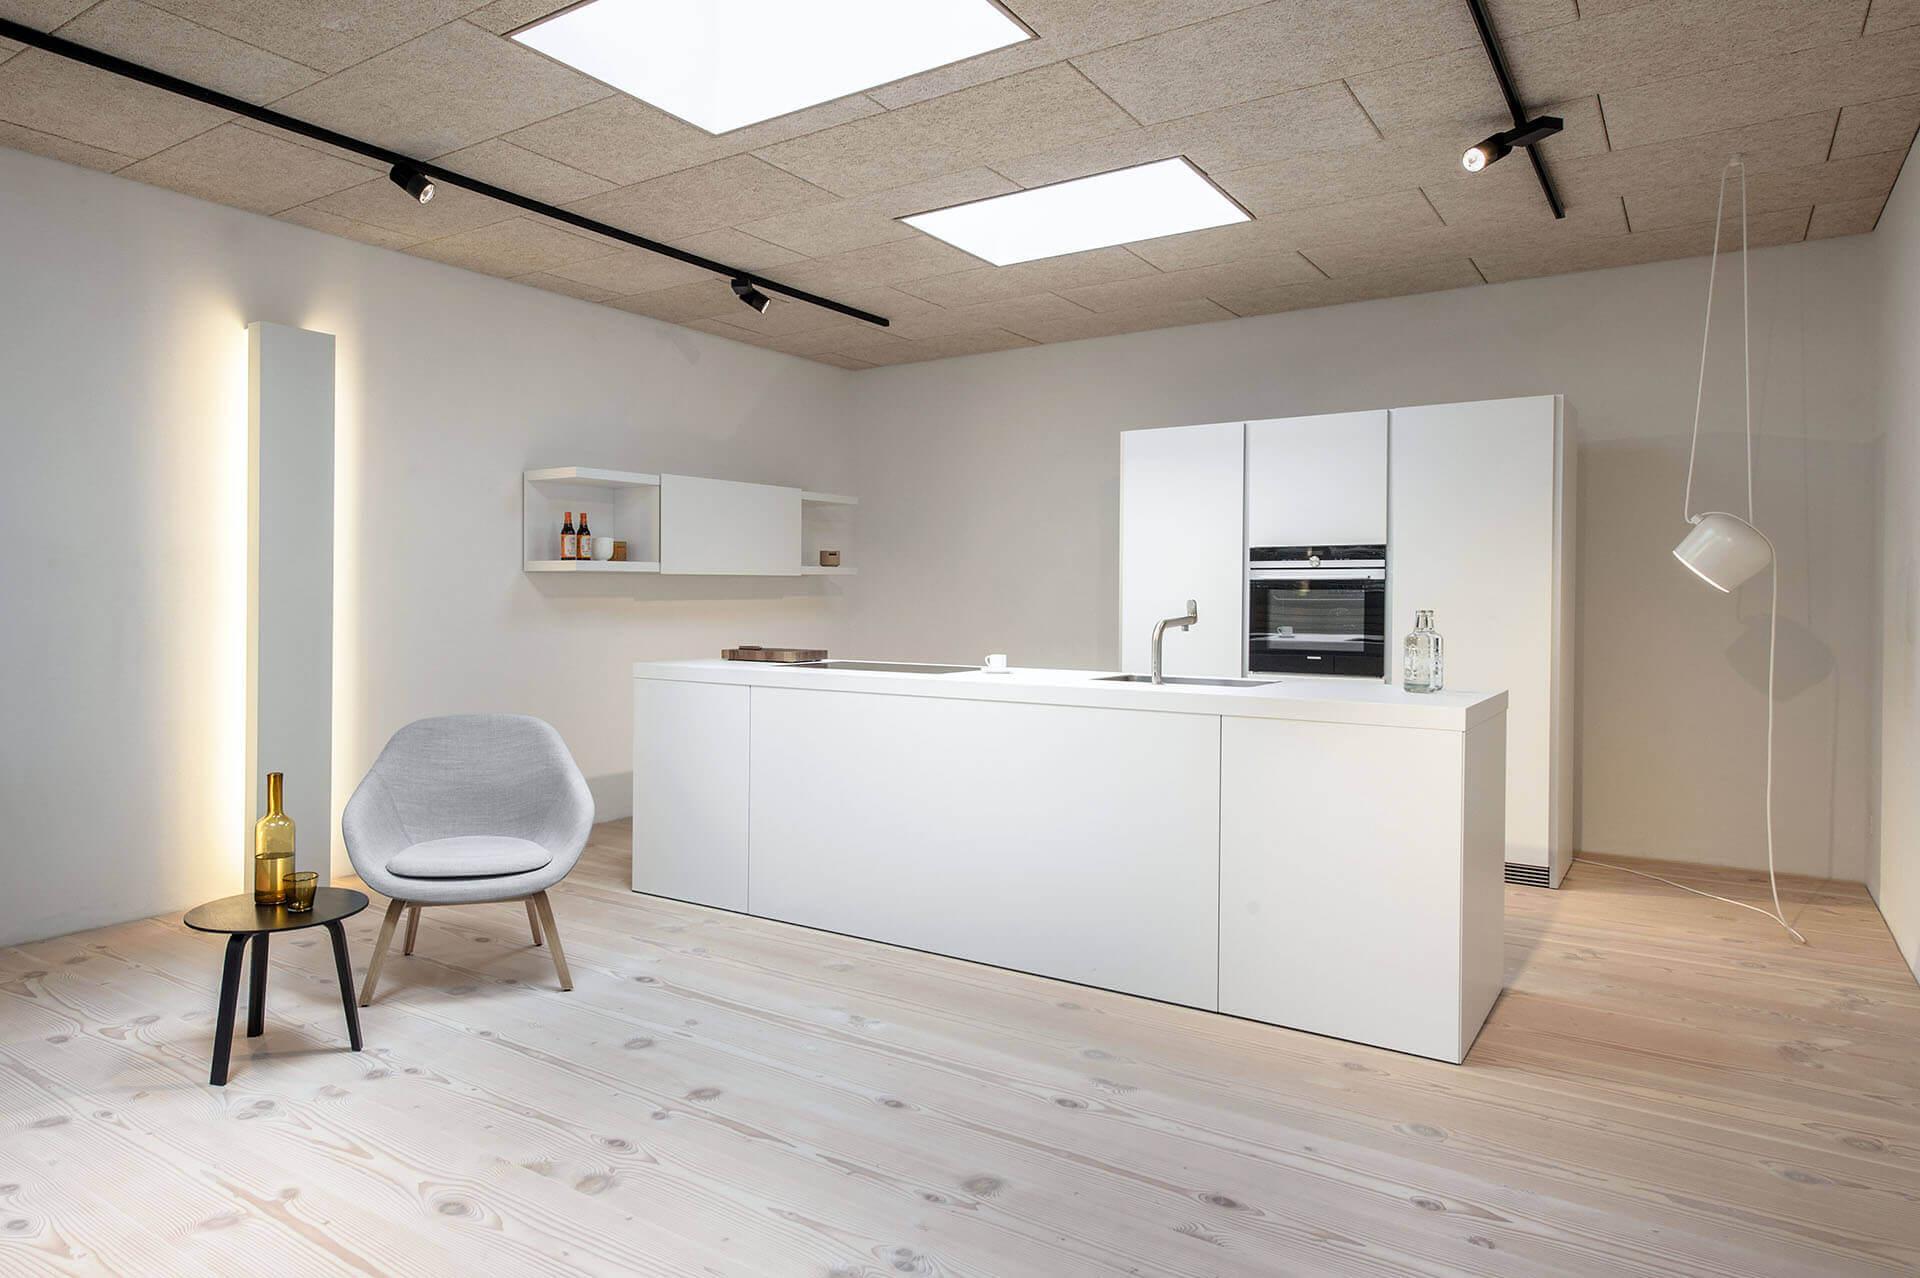 a04 showroom basel ch pur natur. Black Bedroom Furniture Sets. Home Design Ideas